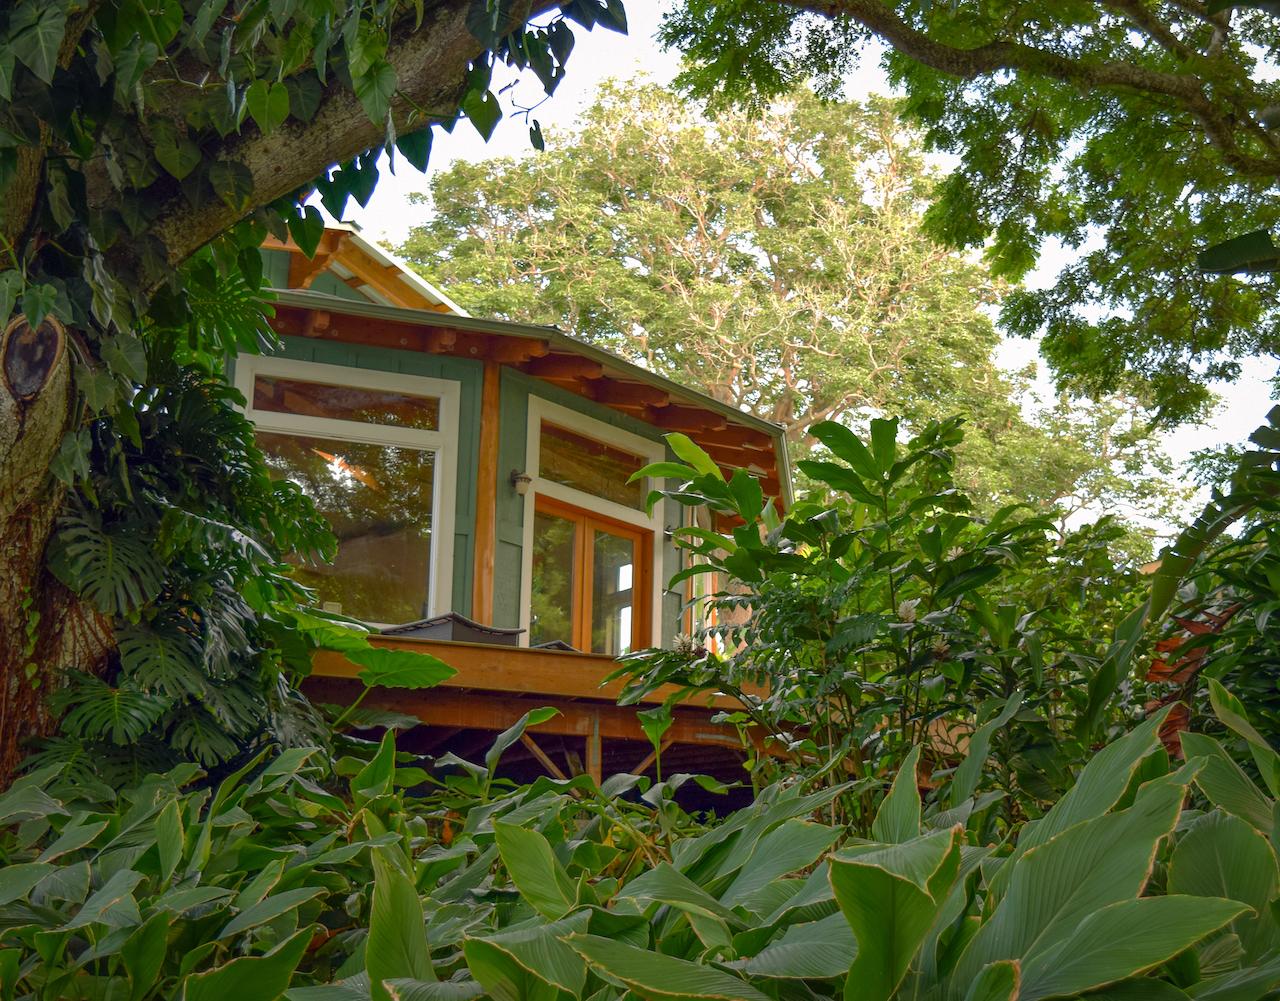 Hawaii Retreat Home - Gingerhill Farm Retreat